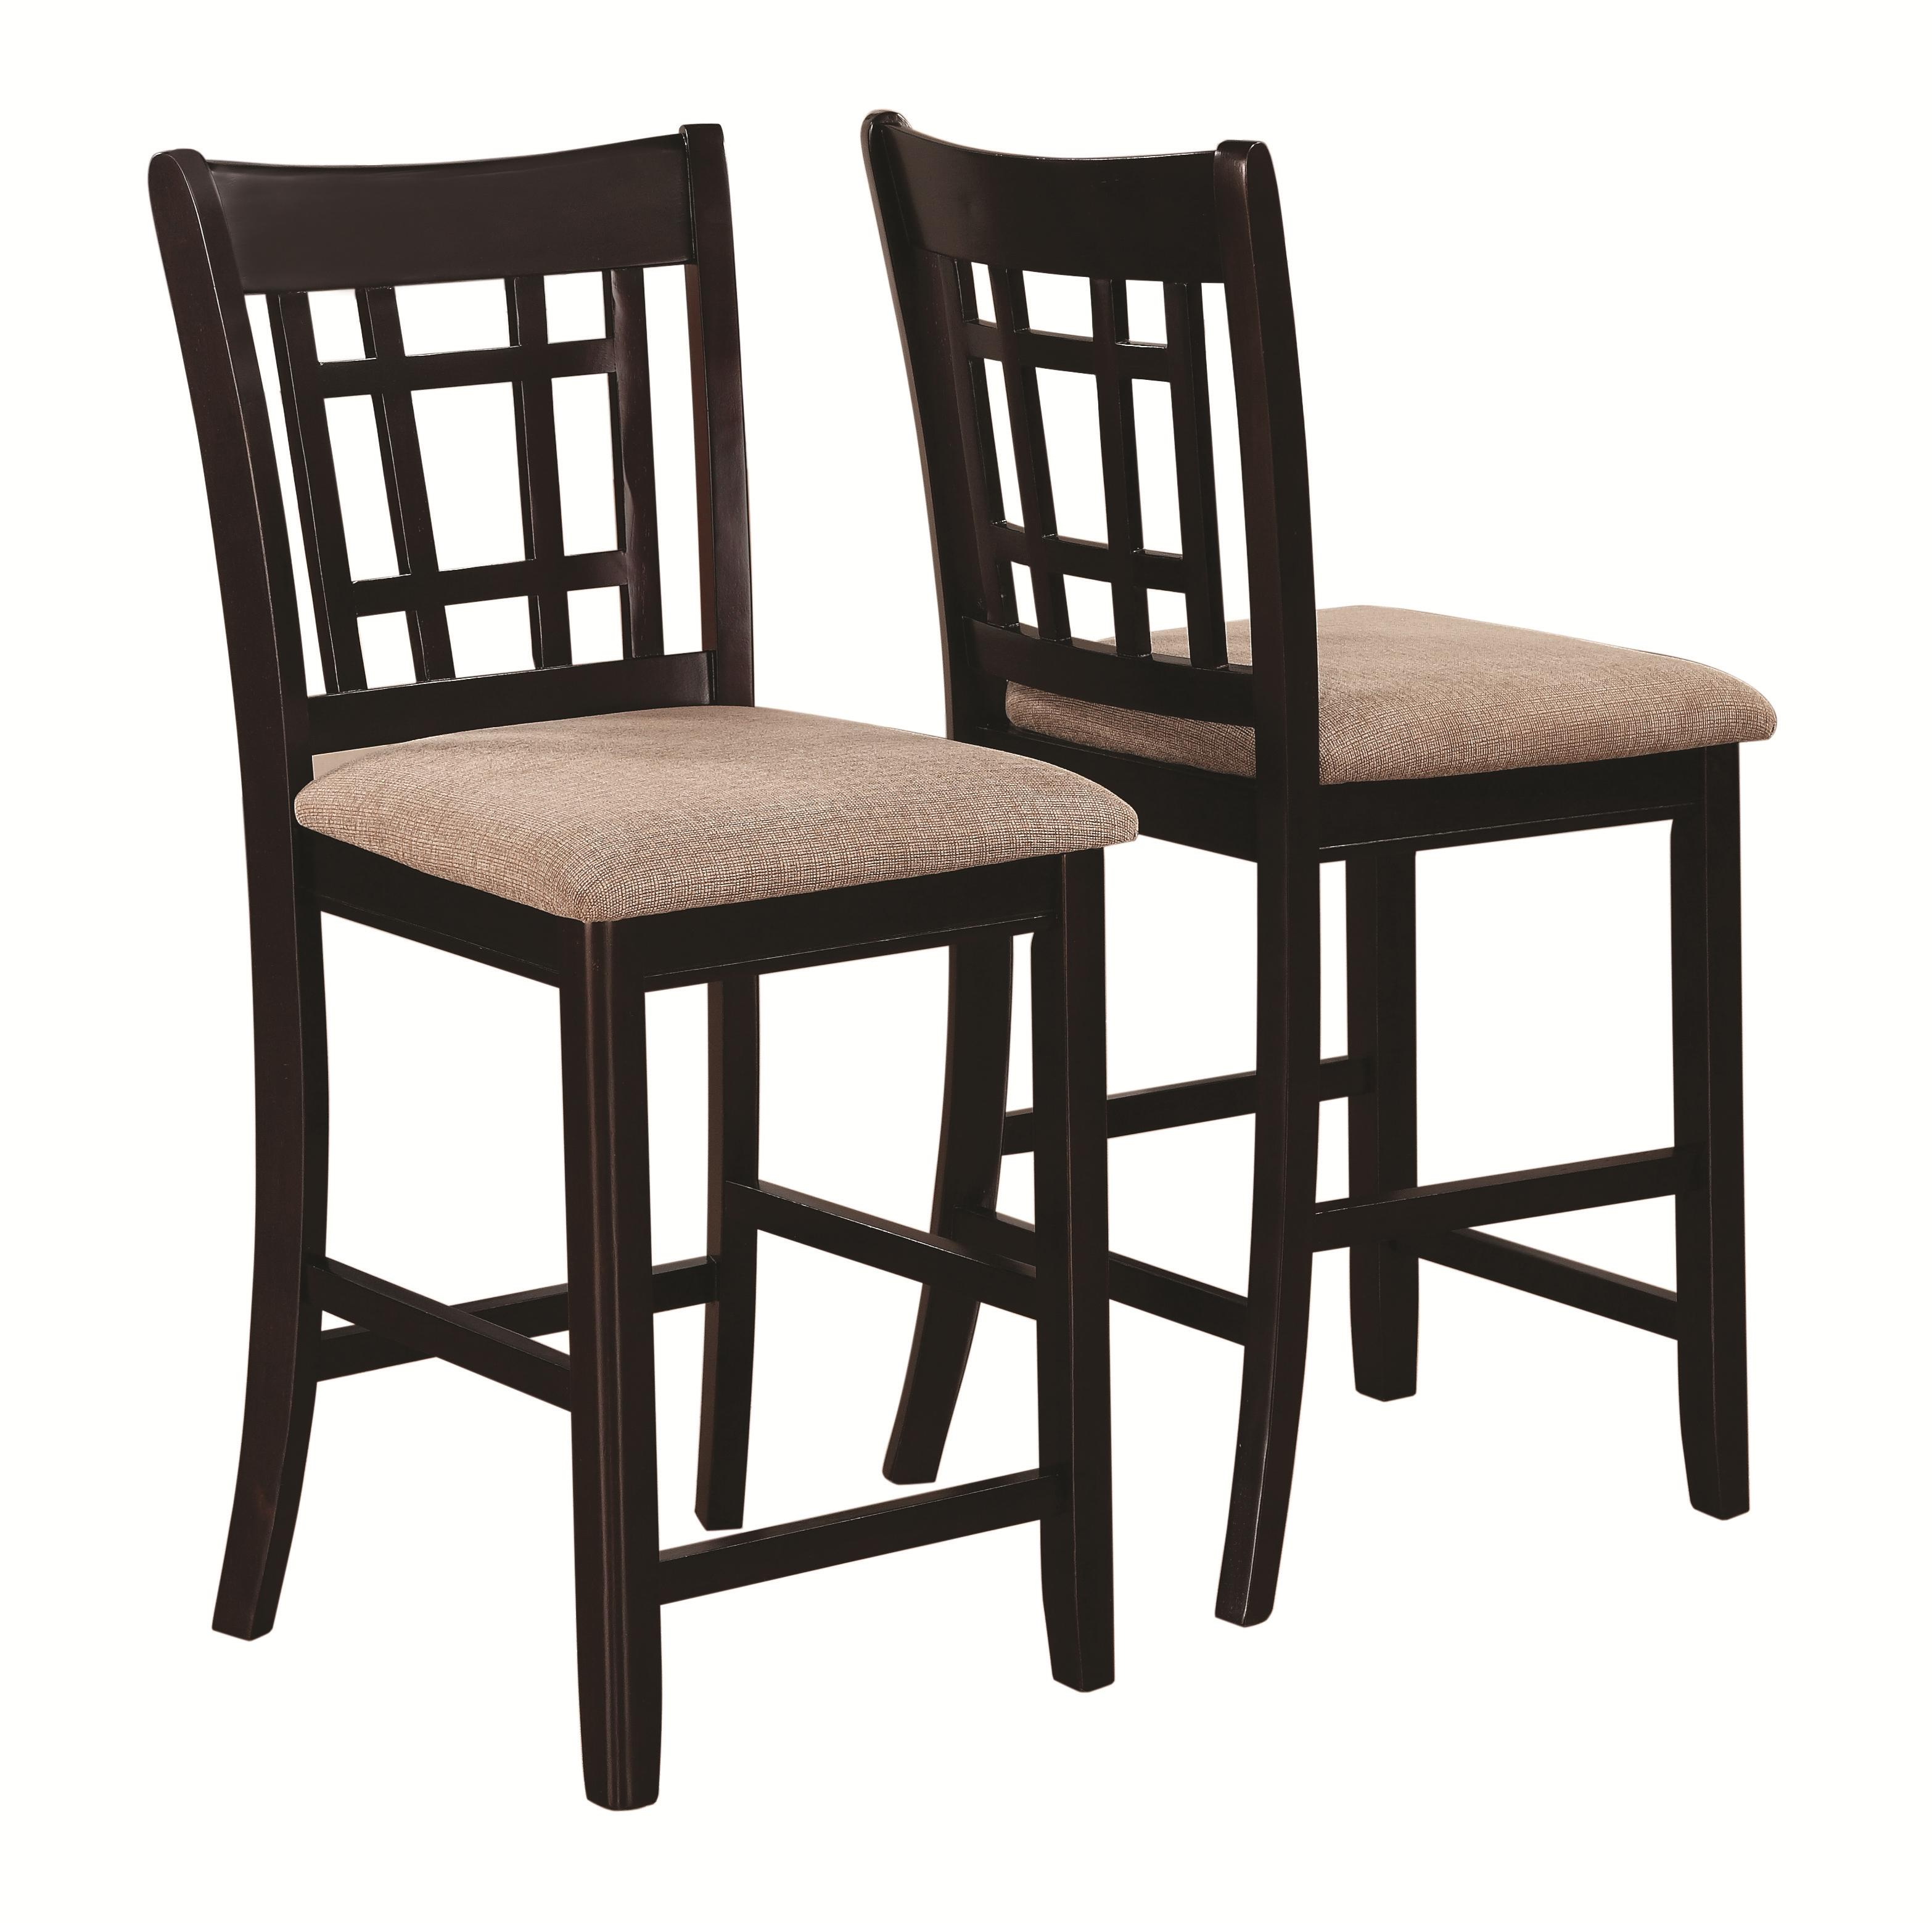 coaster lavon 105279 casual lattice back counter height stool del sol furniture bar stools. Black Bedroom Furniture Sets. Home Design Ideas